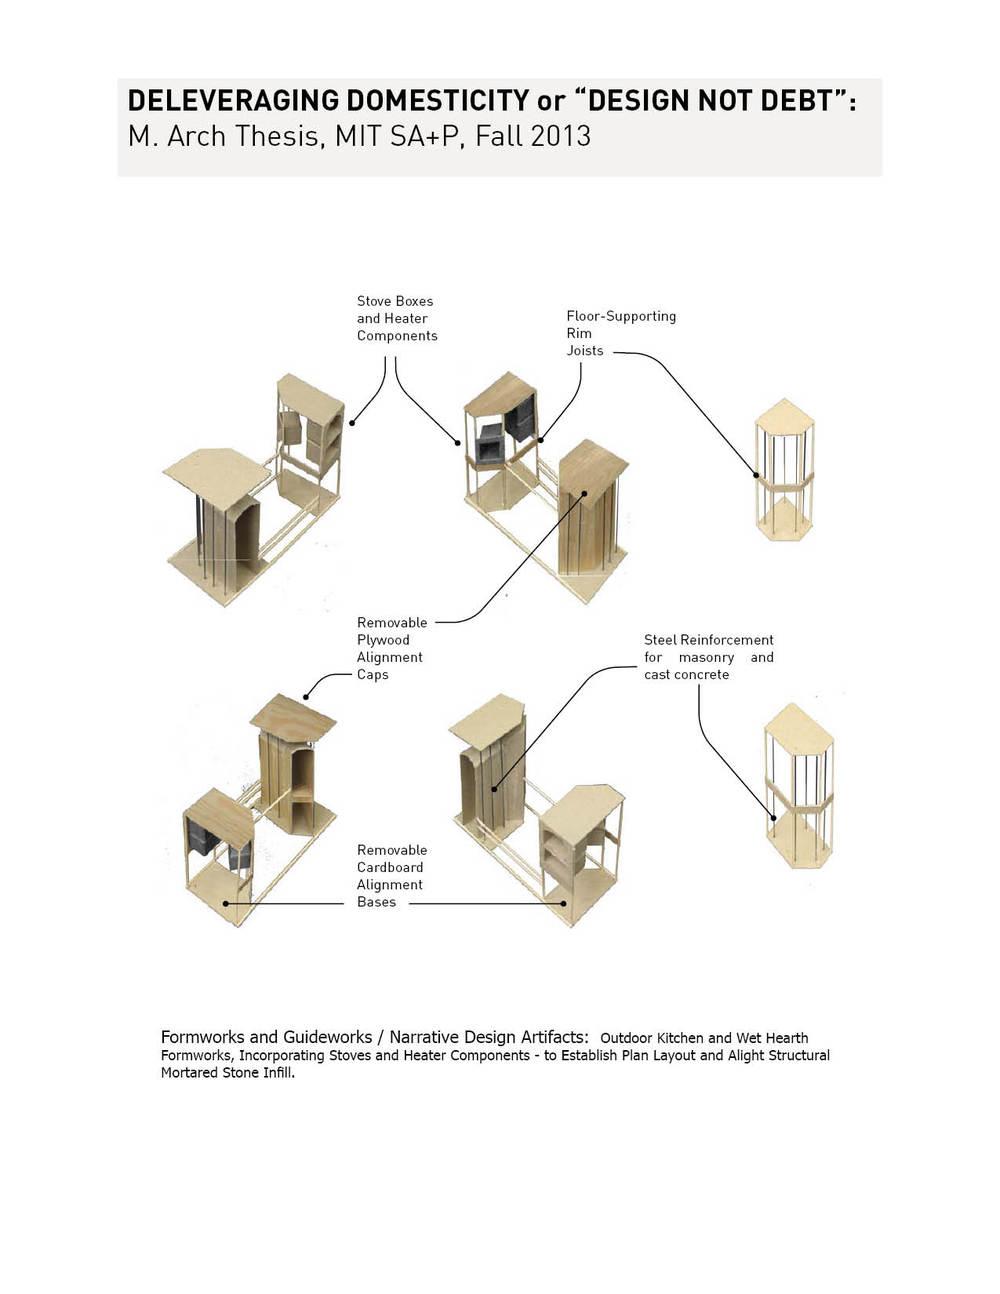 MIT_thesis34.jpg